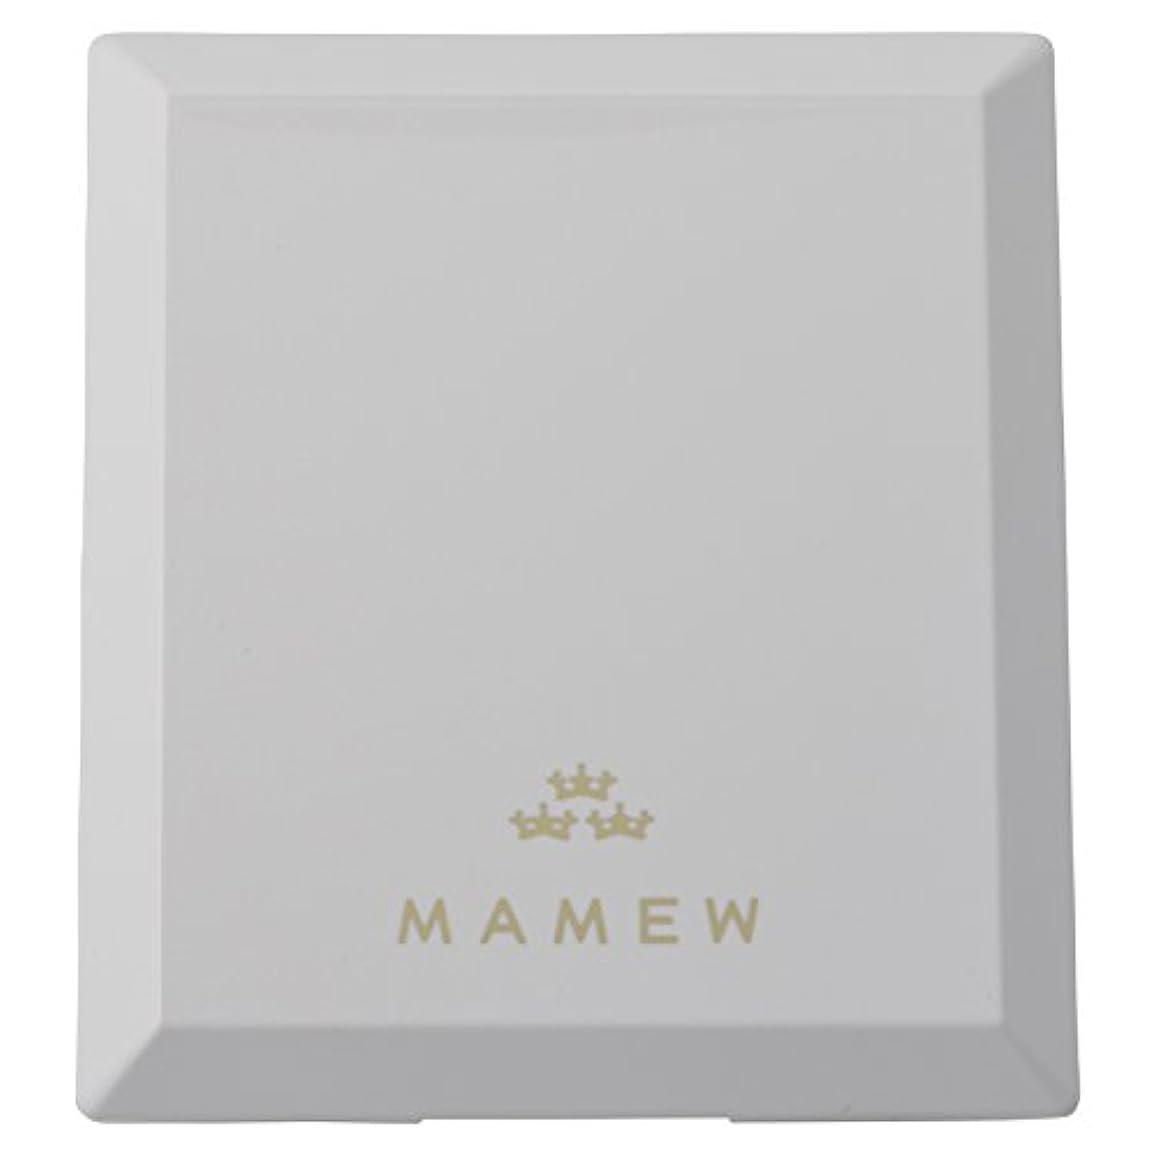 MAMEW(マミュ) カラーコレクションケース-メイクパレッド 鏡付き